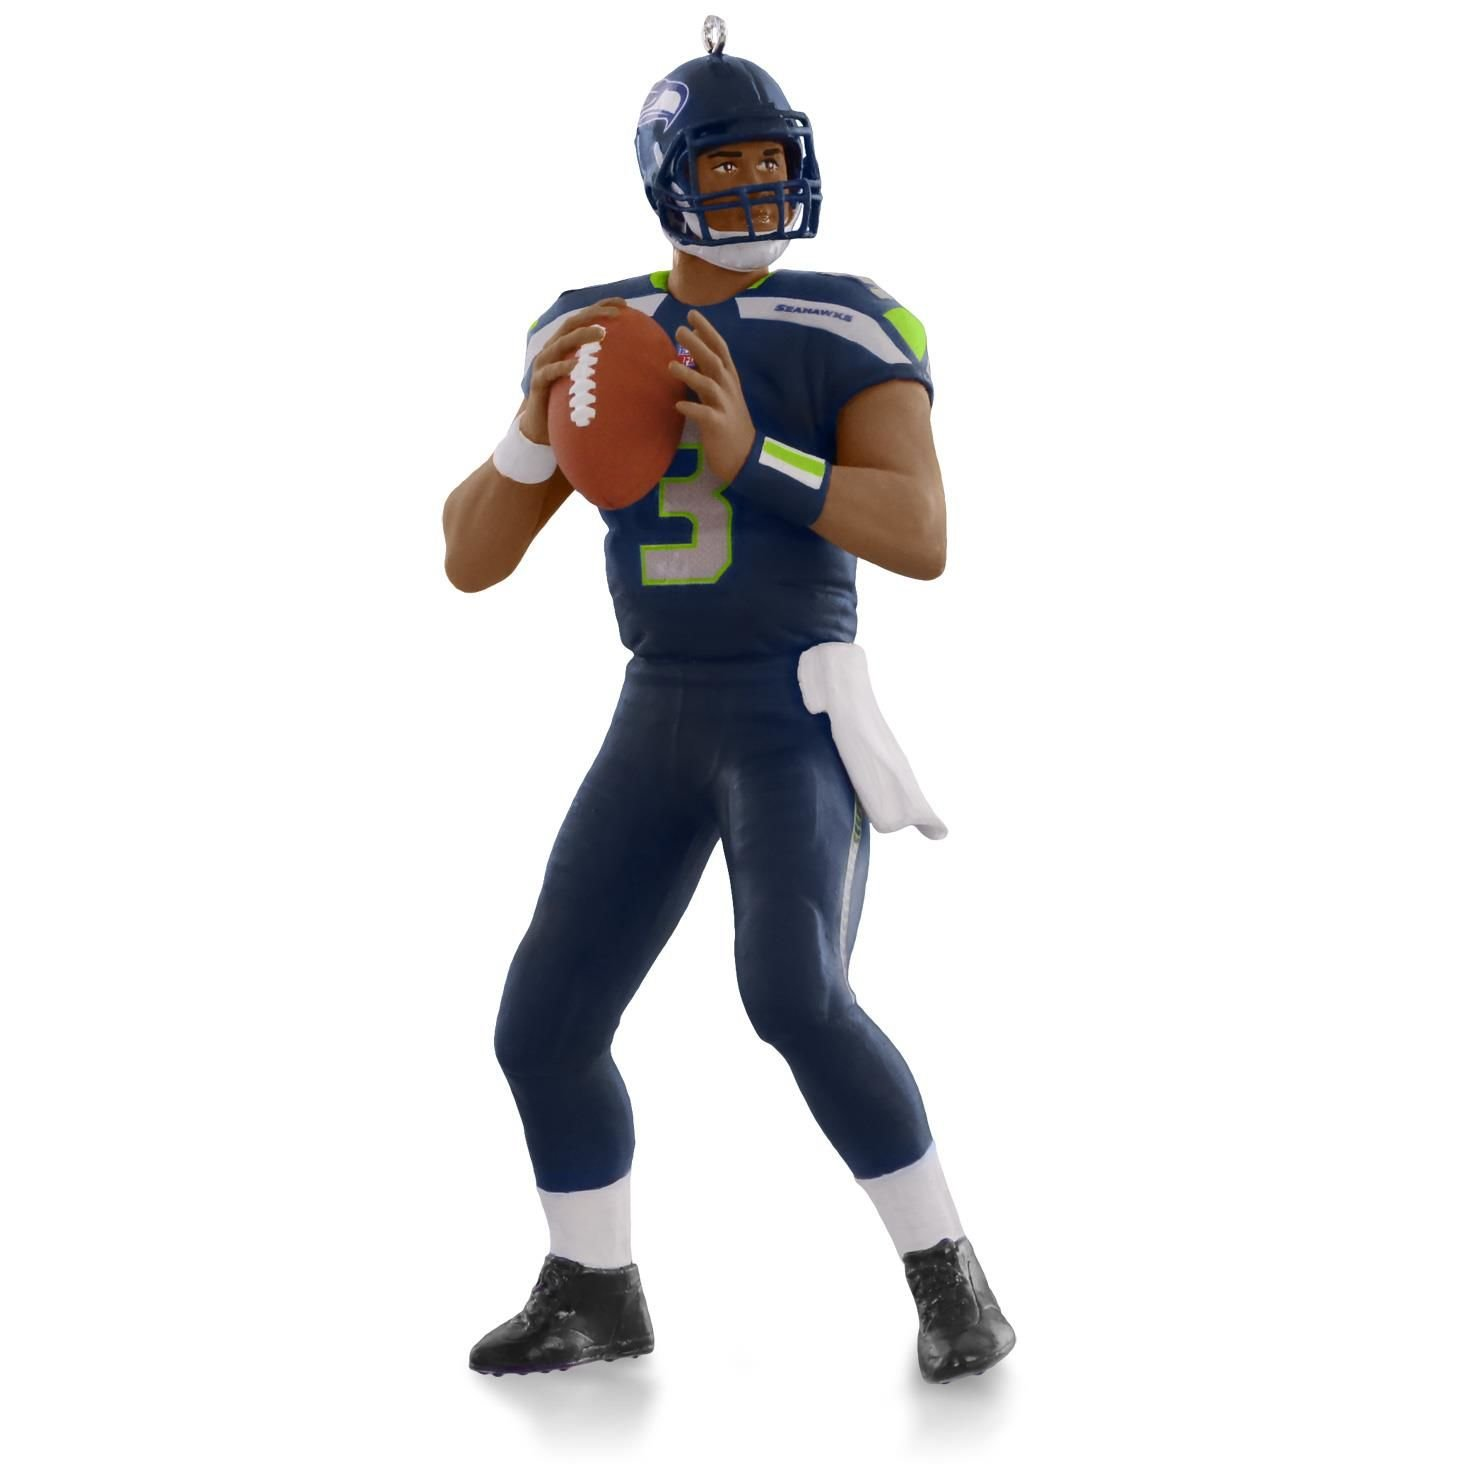 Wholesale NFL Jerseys cheap - Men's Green Bay Packers Jake Ryan Pro Line Team Color Jersey